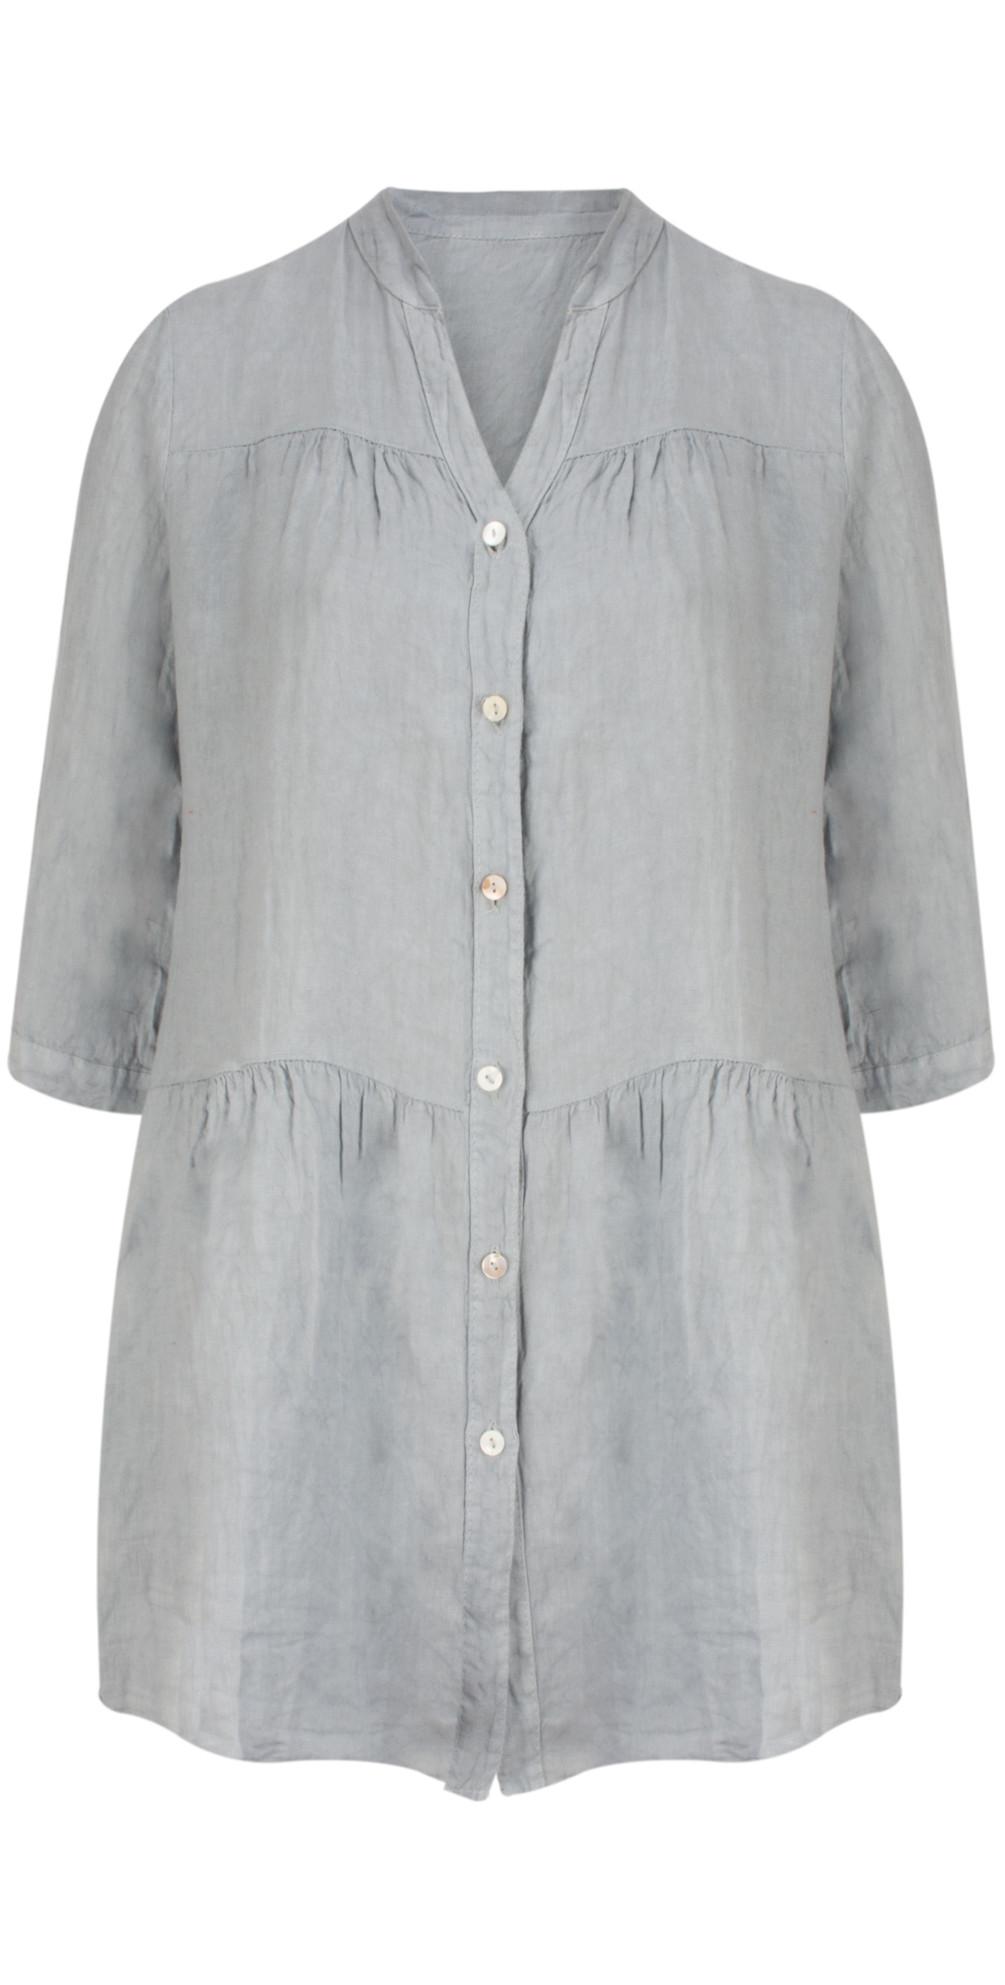 Della Oversized Tunic Shirt main image